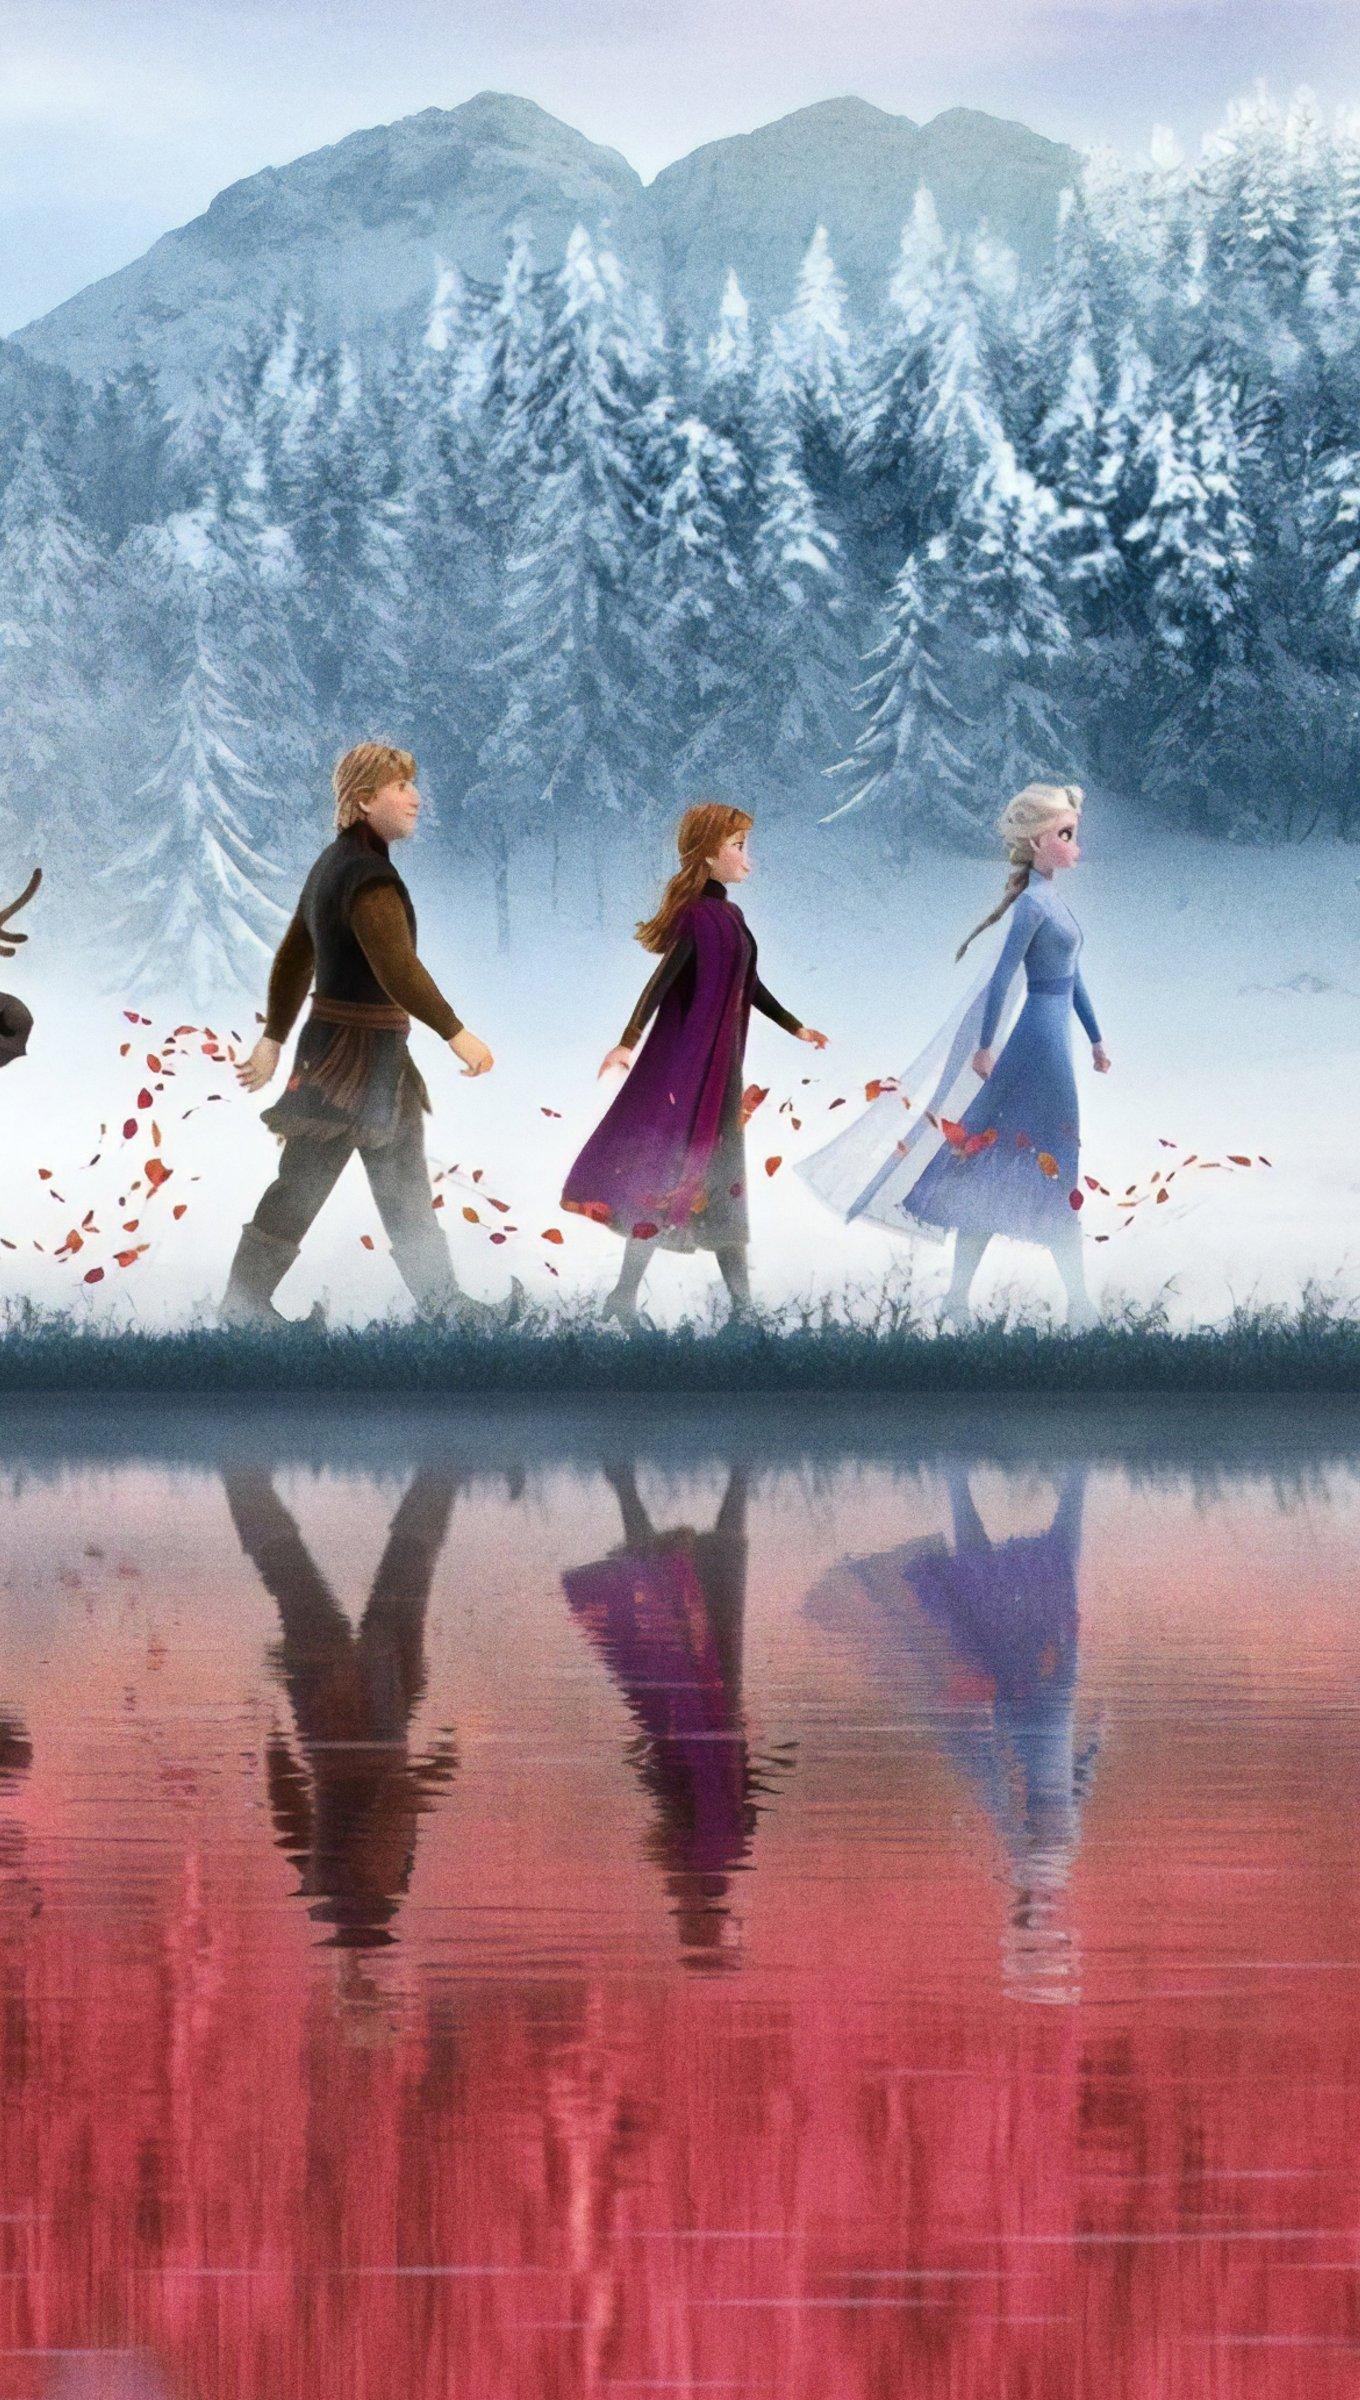 Fondos de pantalla Personajes de Frozen caminando Vertical